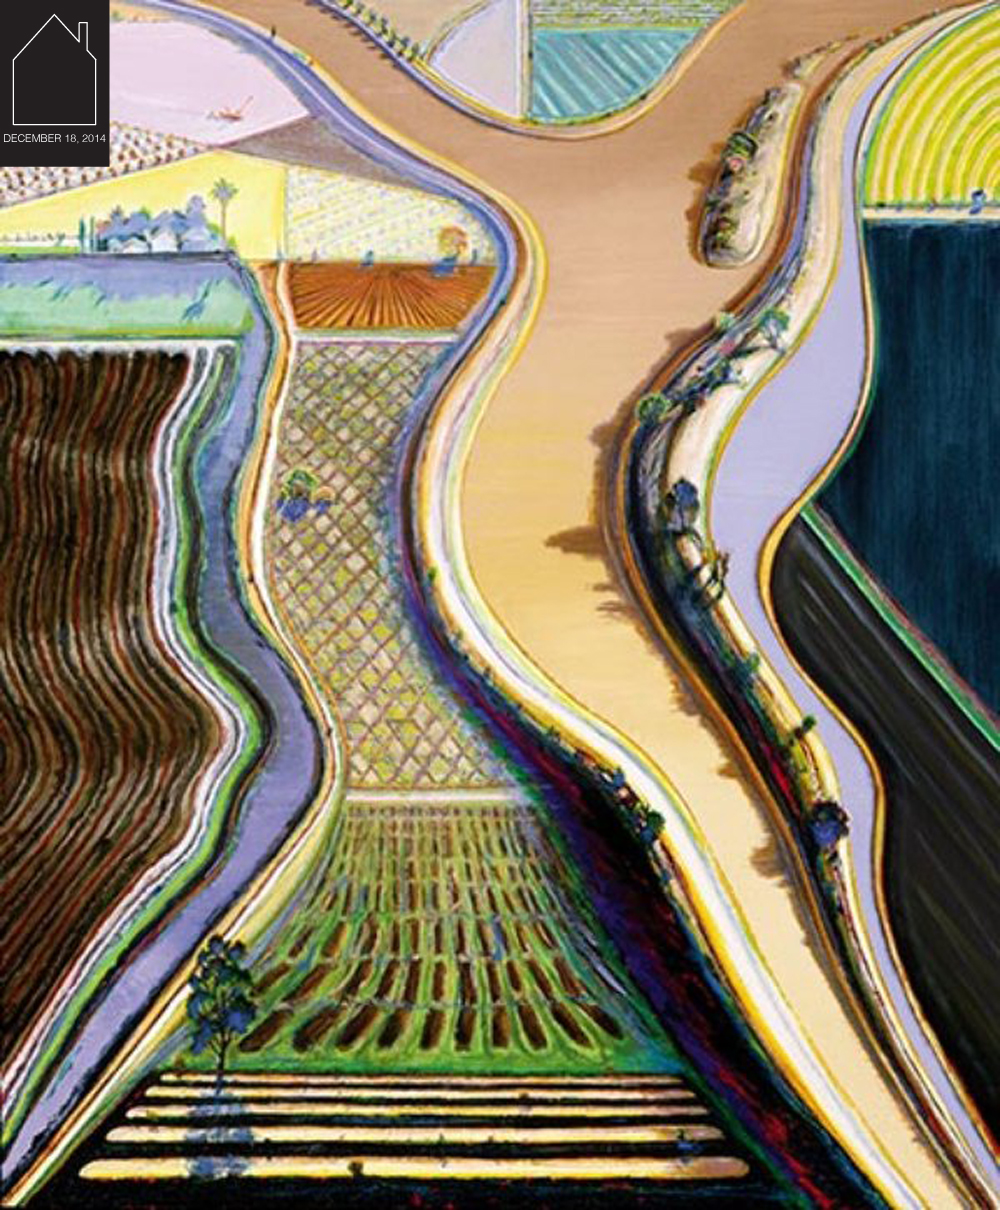 Brown River - 2002 - Wayne Theibaud via Smithsonian